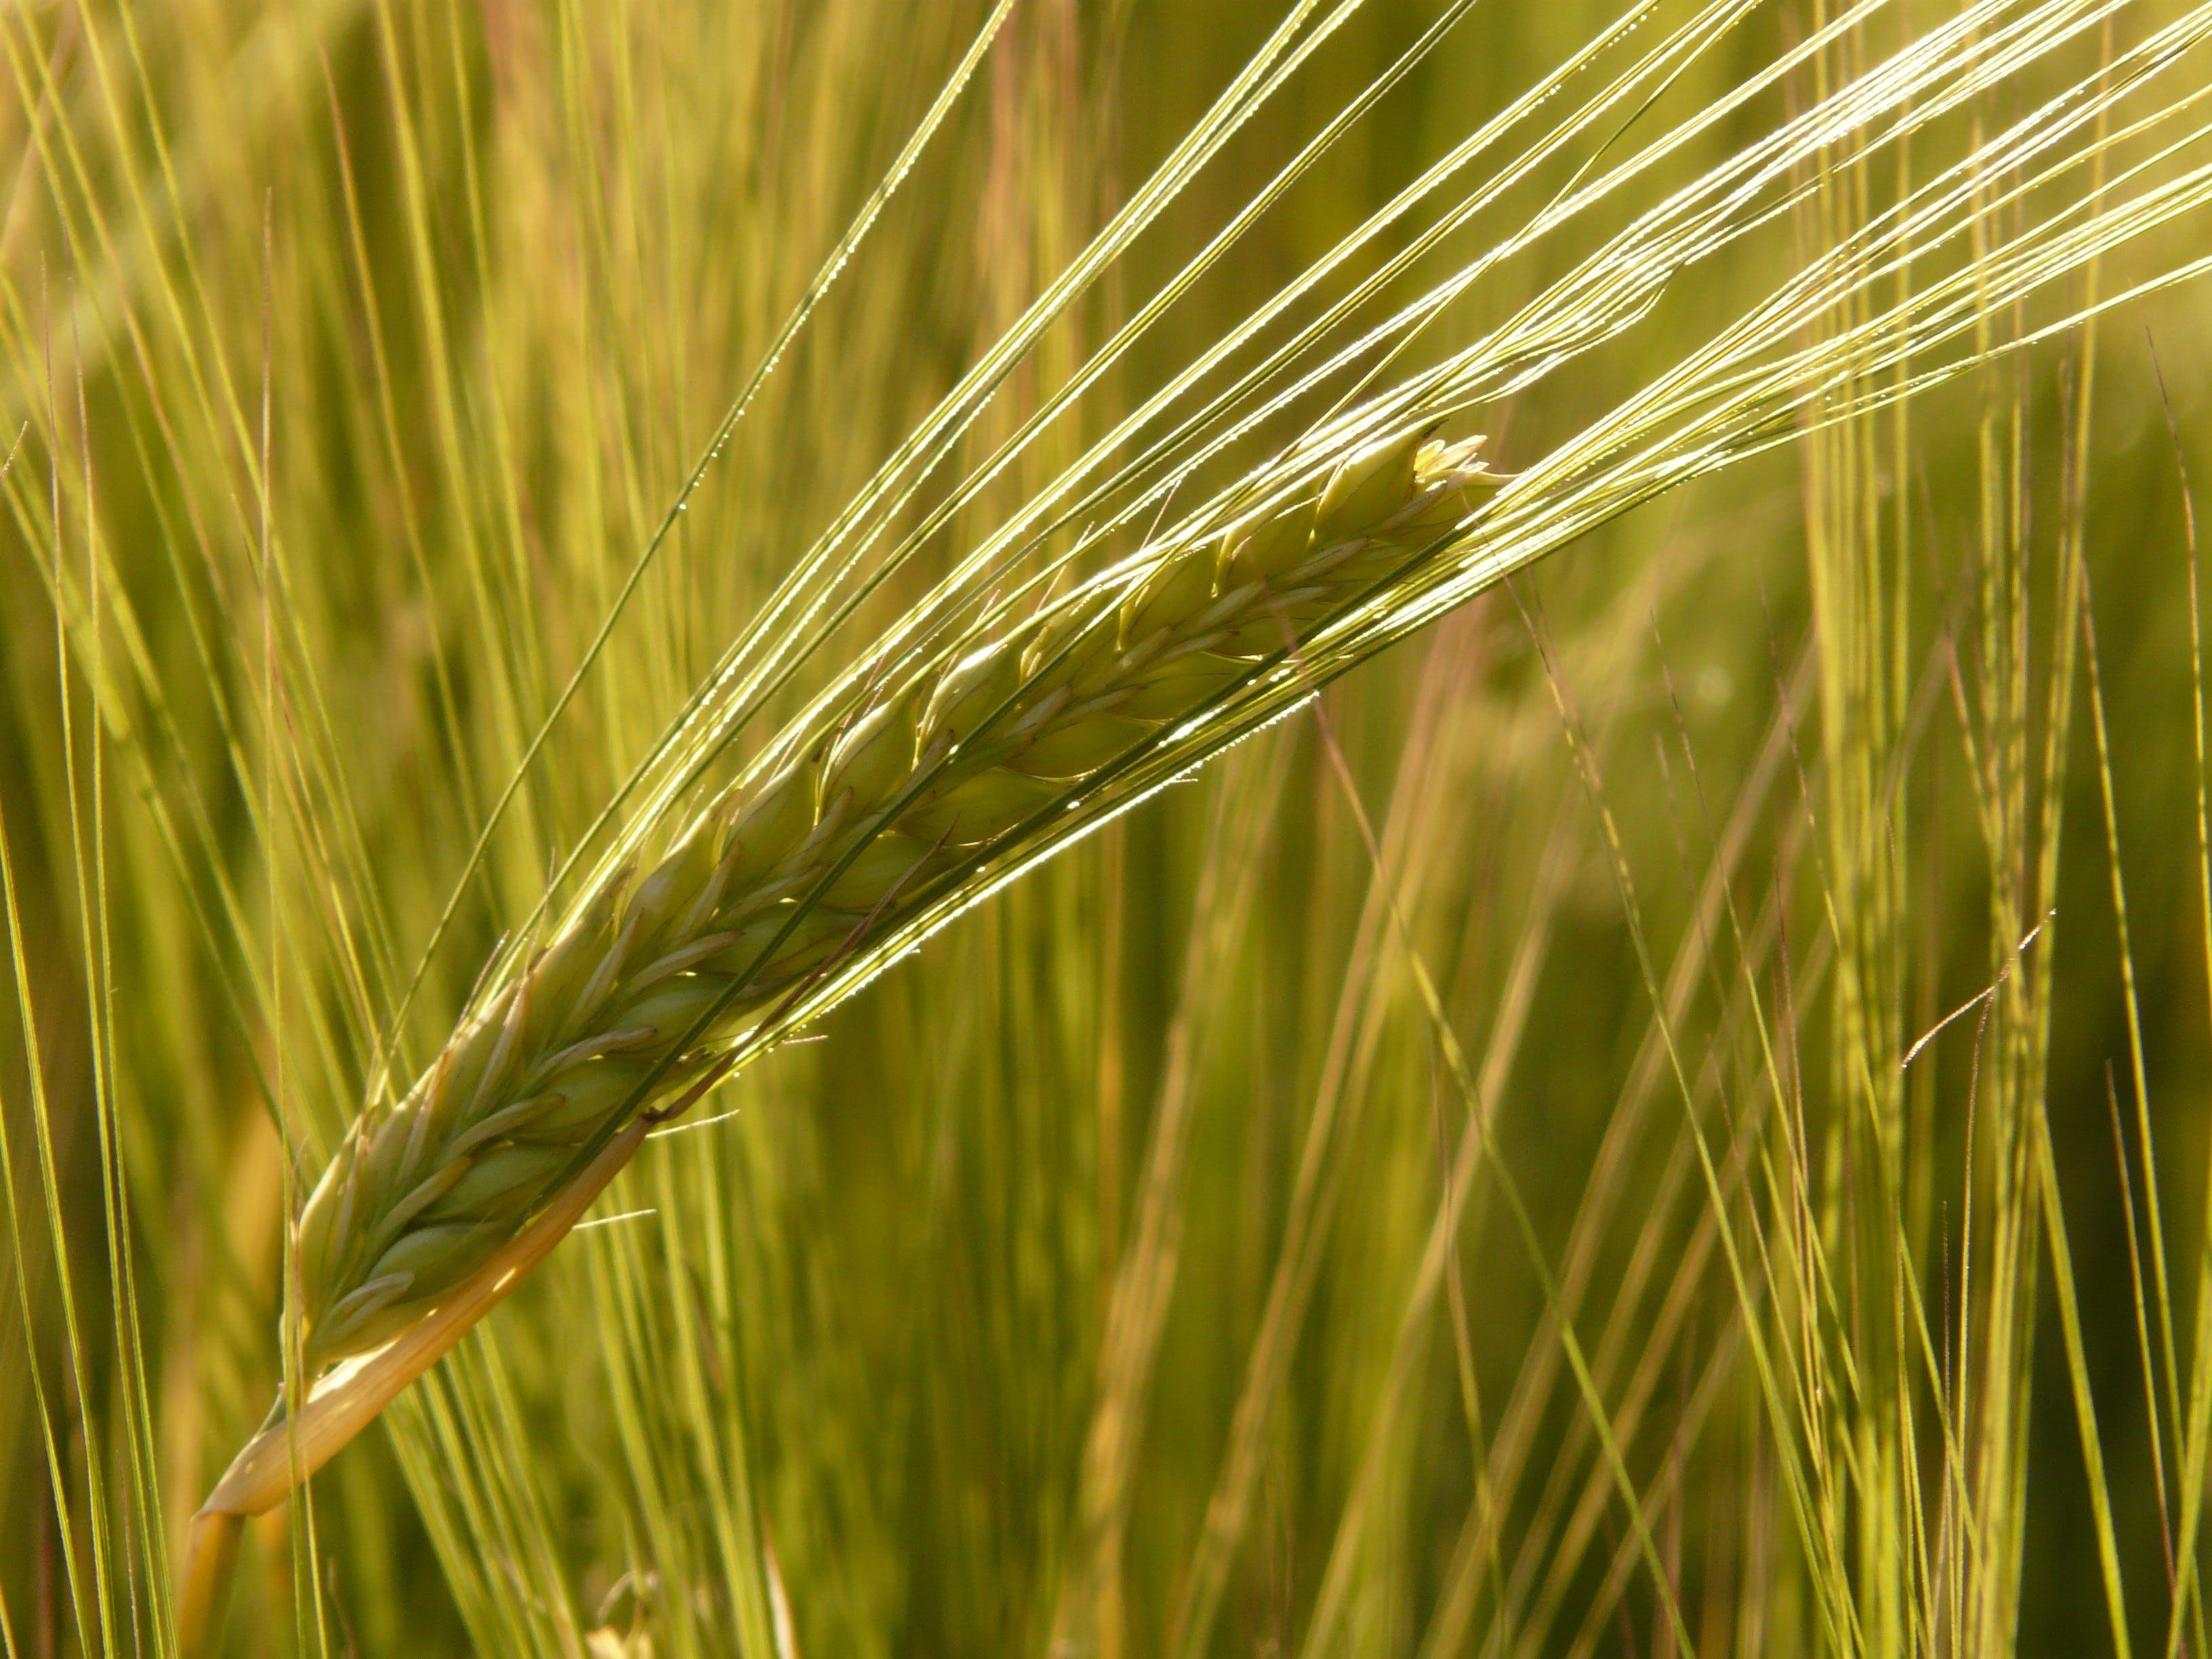 barley, cereal, field